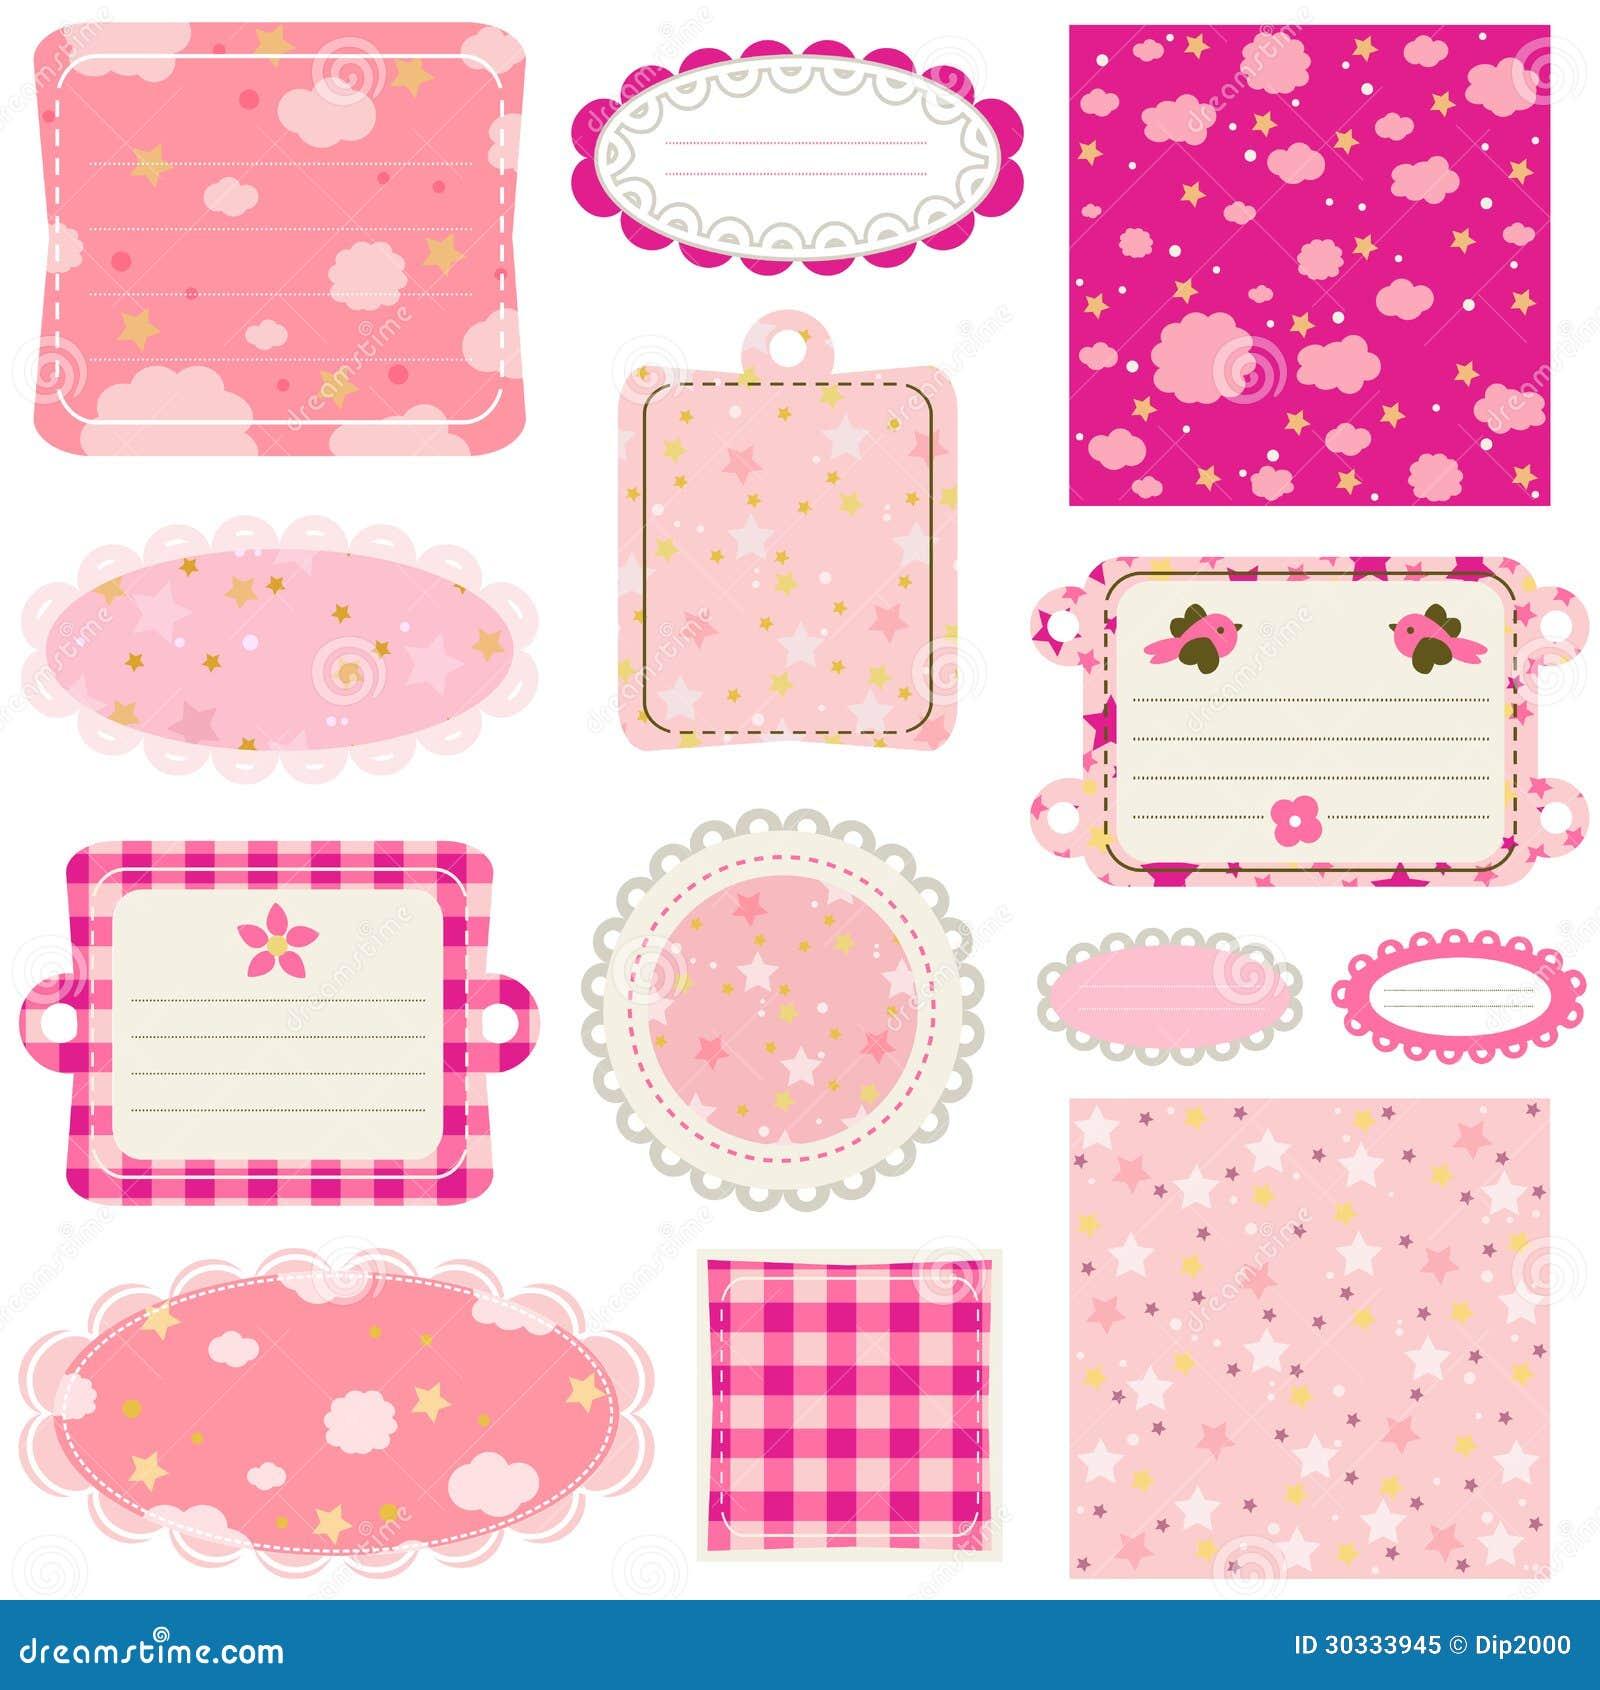 How to scrapbook for baby girl - Baby Girl Design Elements